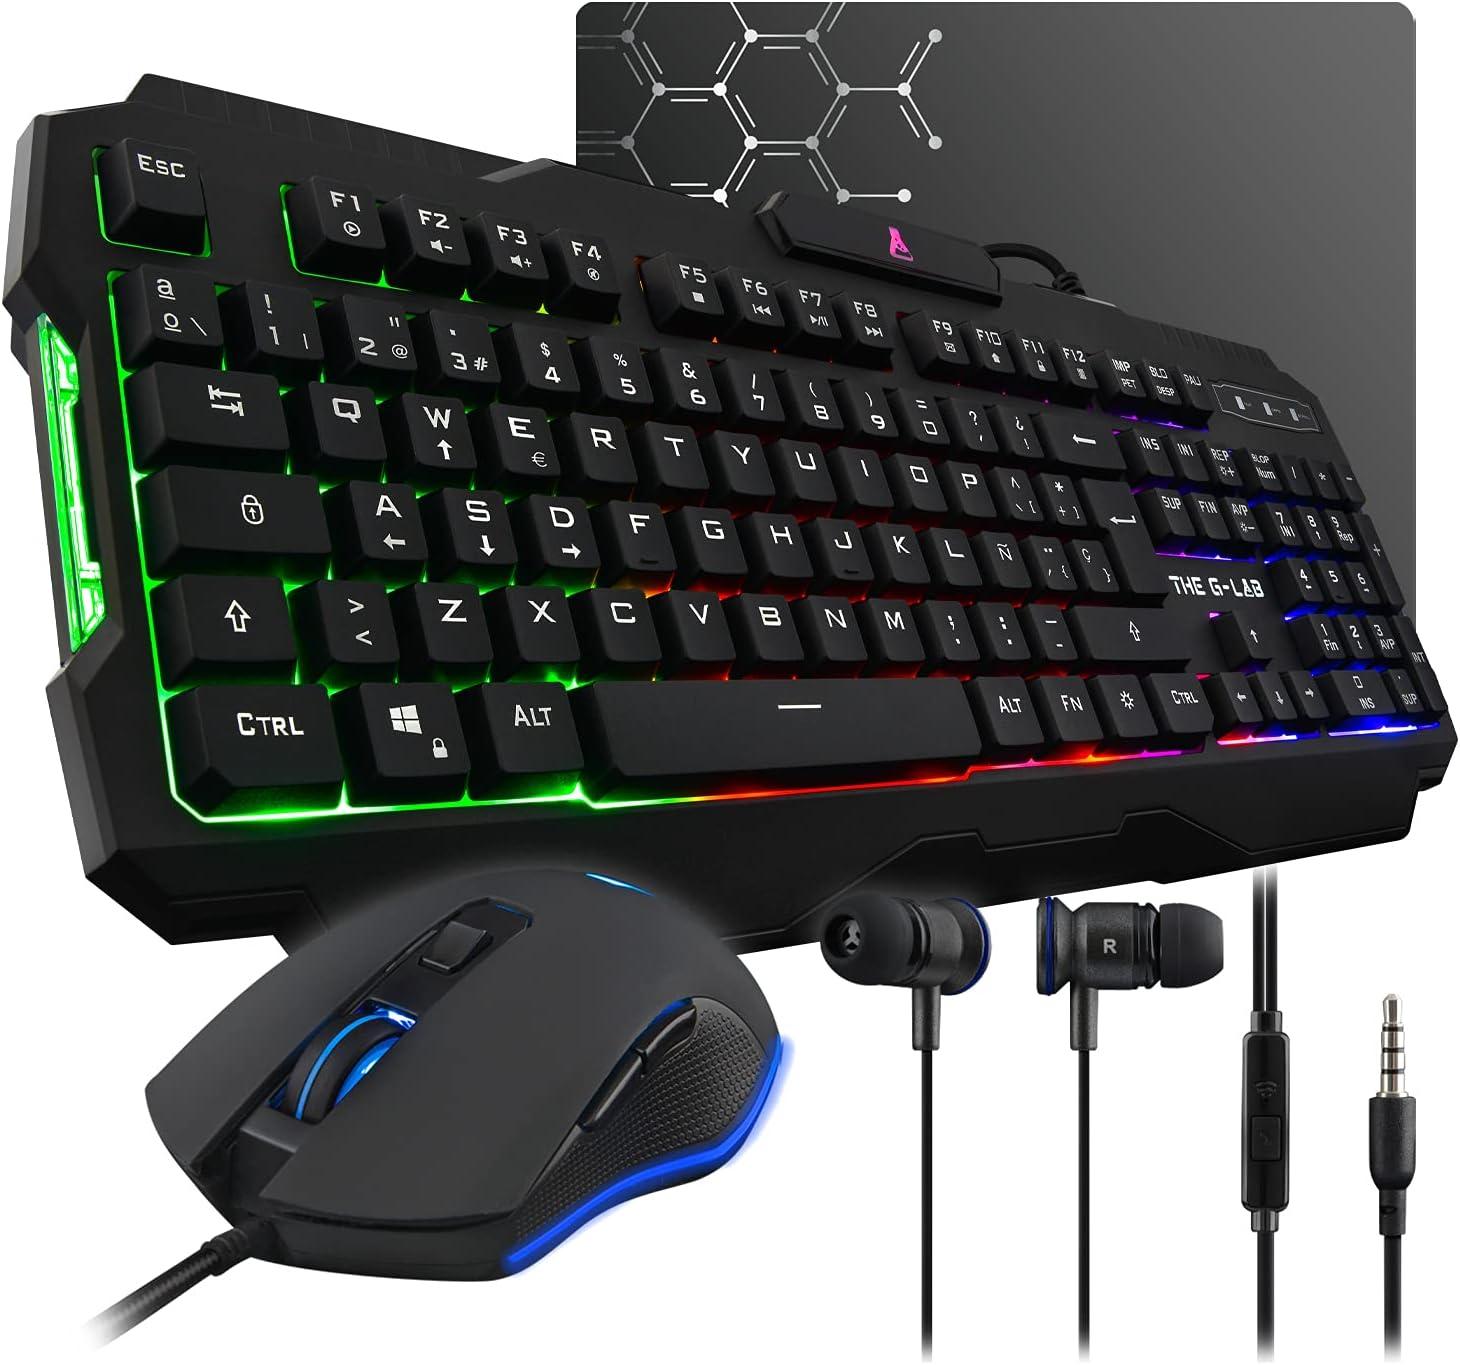 THE G-LAB Combo HELIUM 4 en 1 Gaming Bundle - Teclado Gaming QWERTY – Incluye Ñ - Retroiluminado, Ratón Gaming de 2400 DPI, Auriculares in-ear, ...